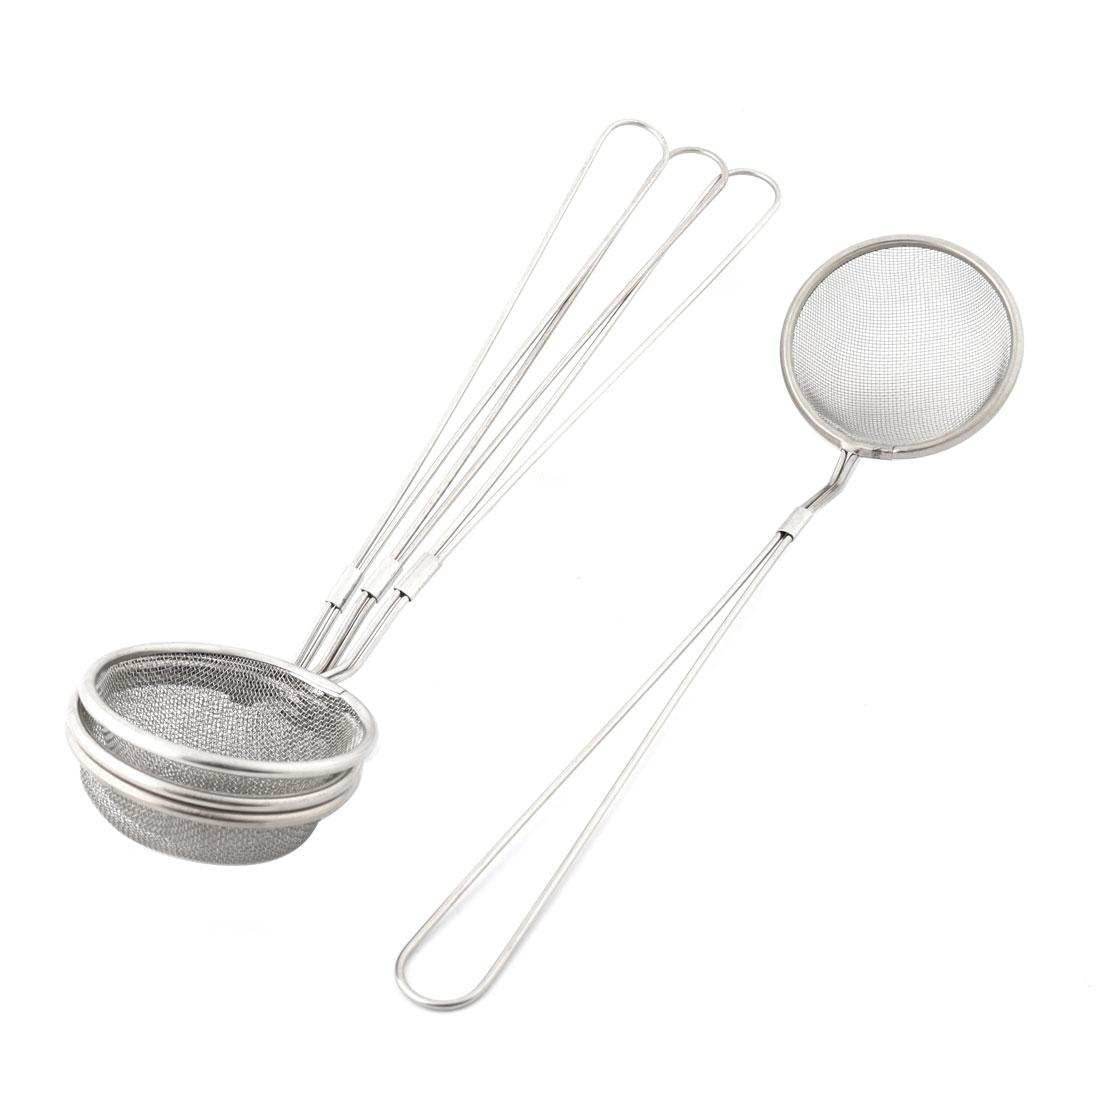 Home Kitchen Metal Flour Colander Grease Mesh Strainer Silver Tone 7cm Dia 4pcs